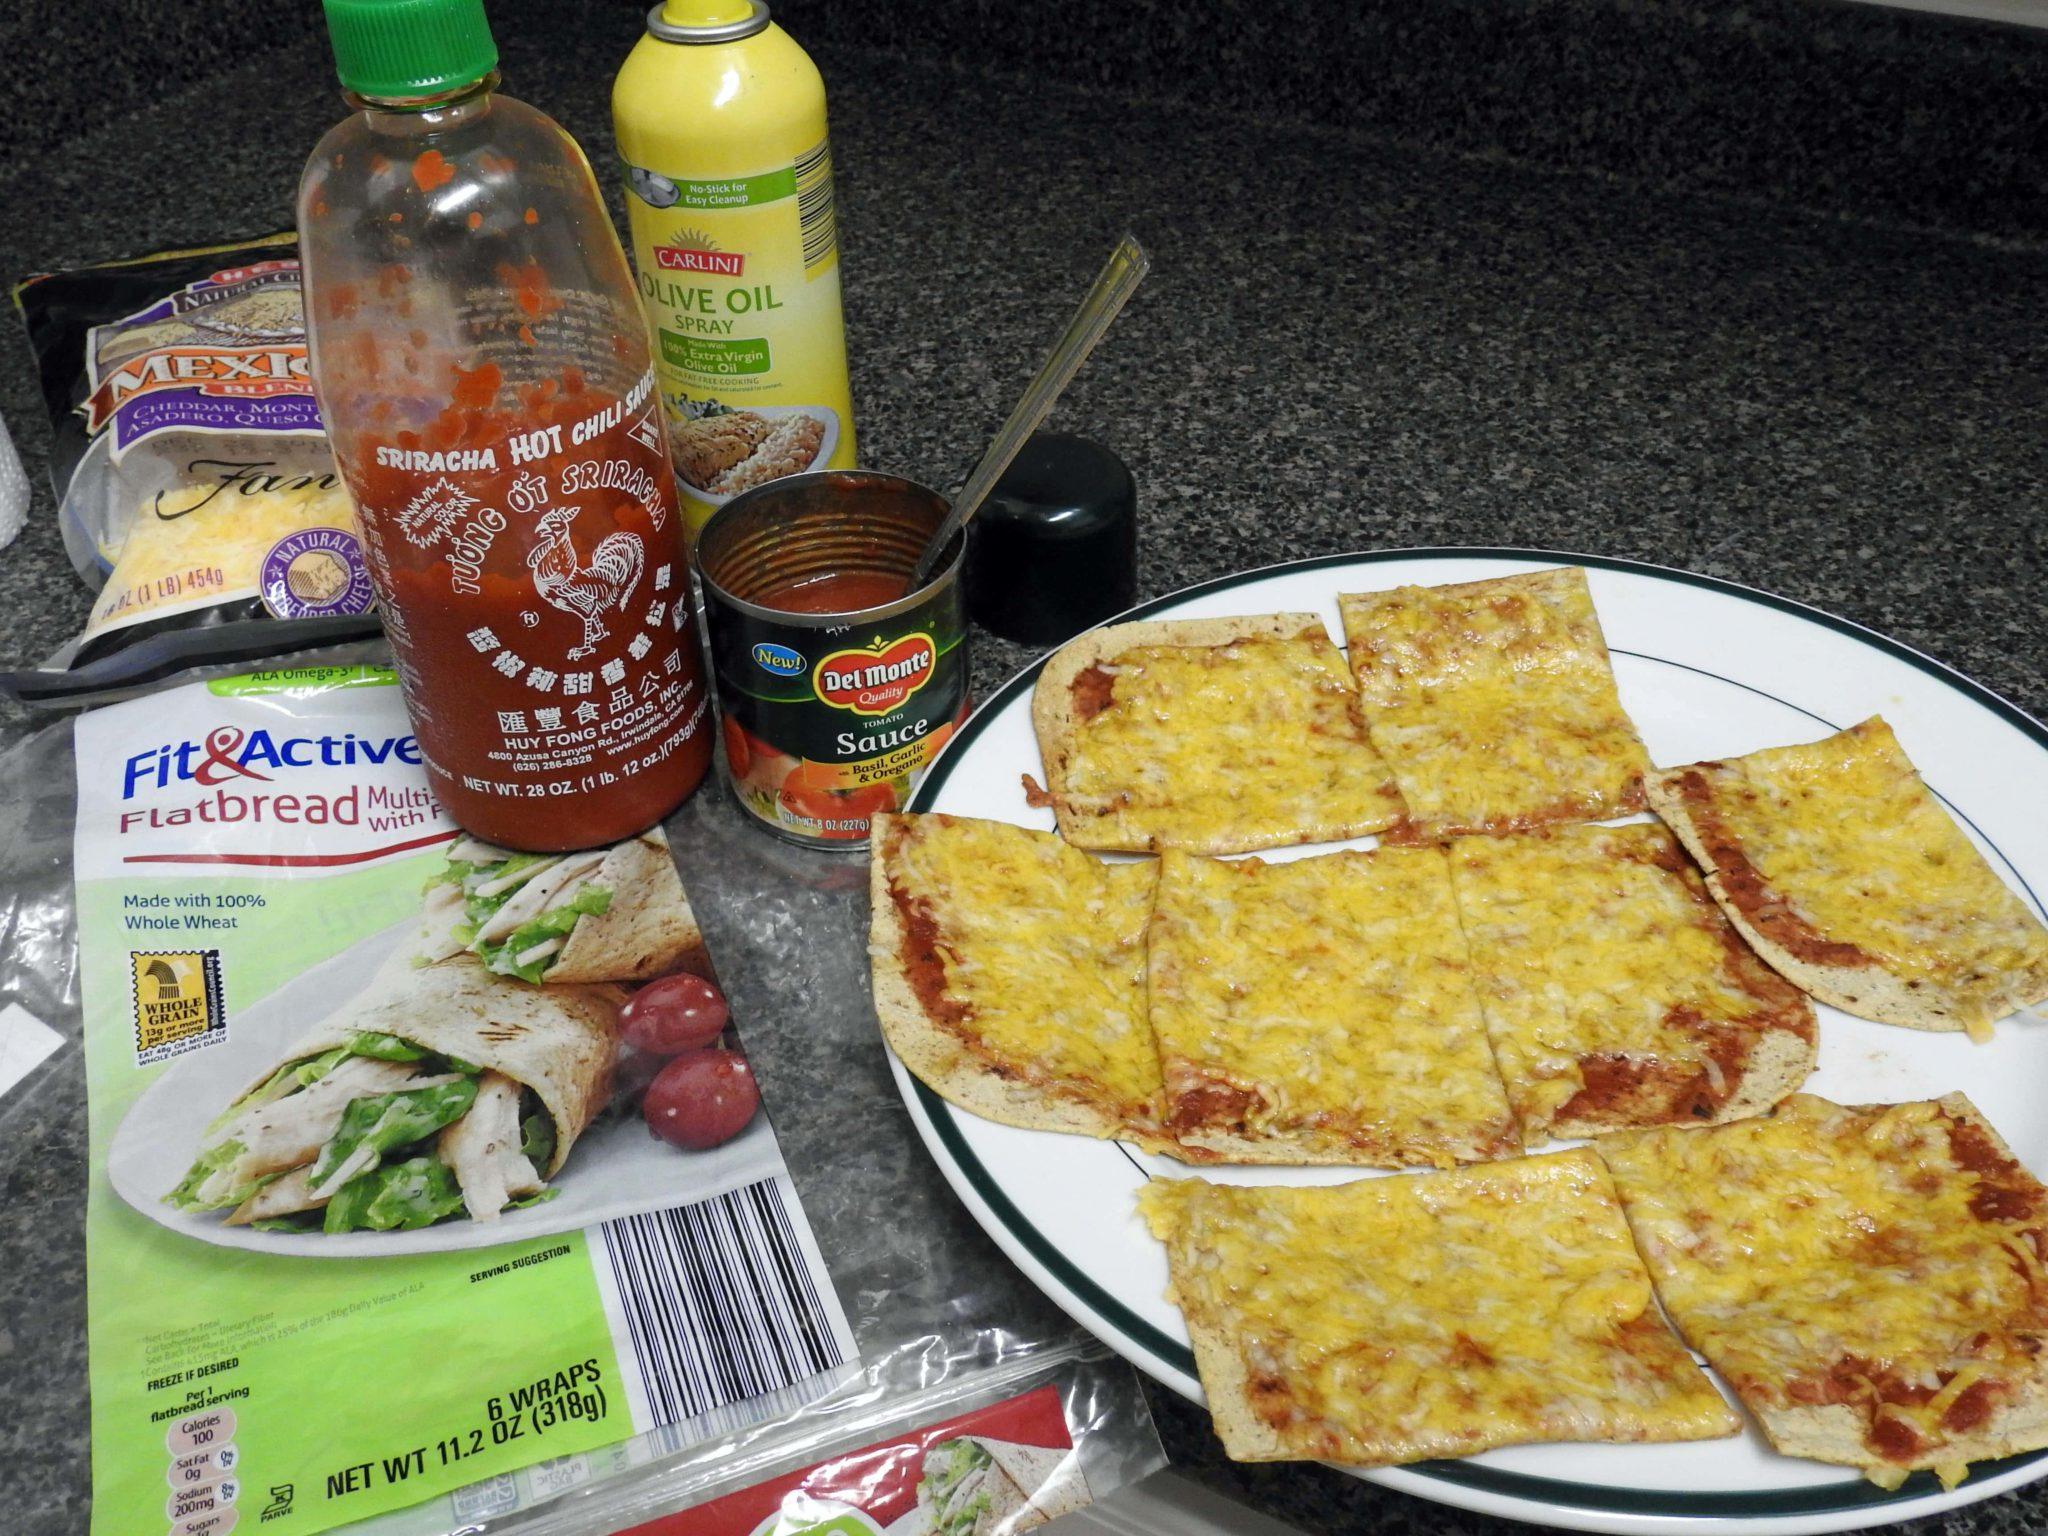 5 Ingredient Low Glycemic Sriracha Flatbread